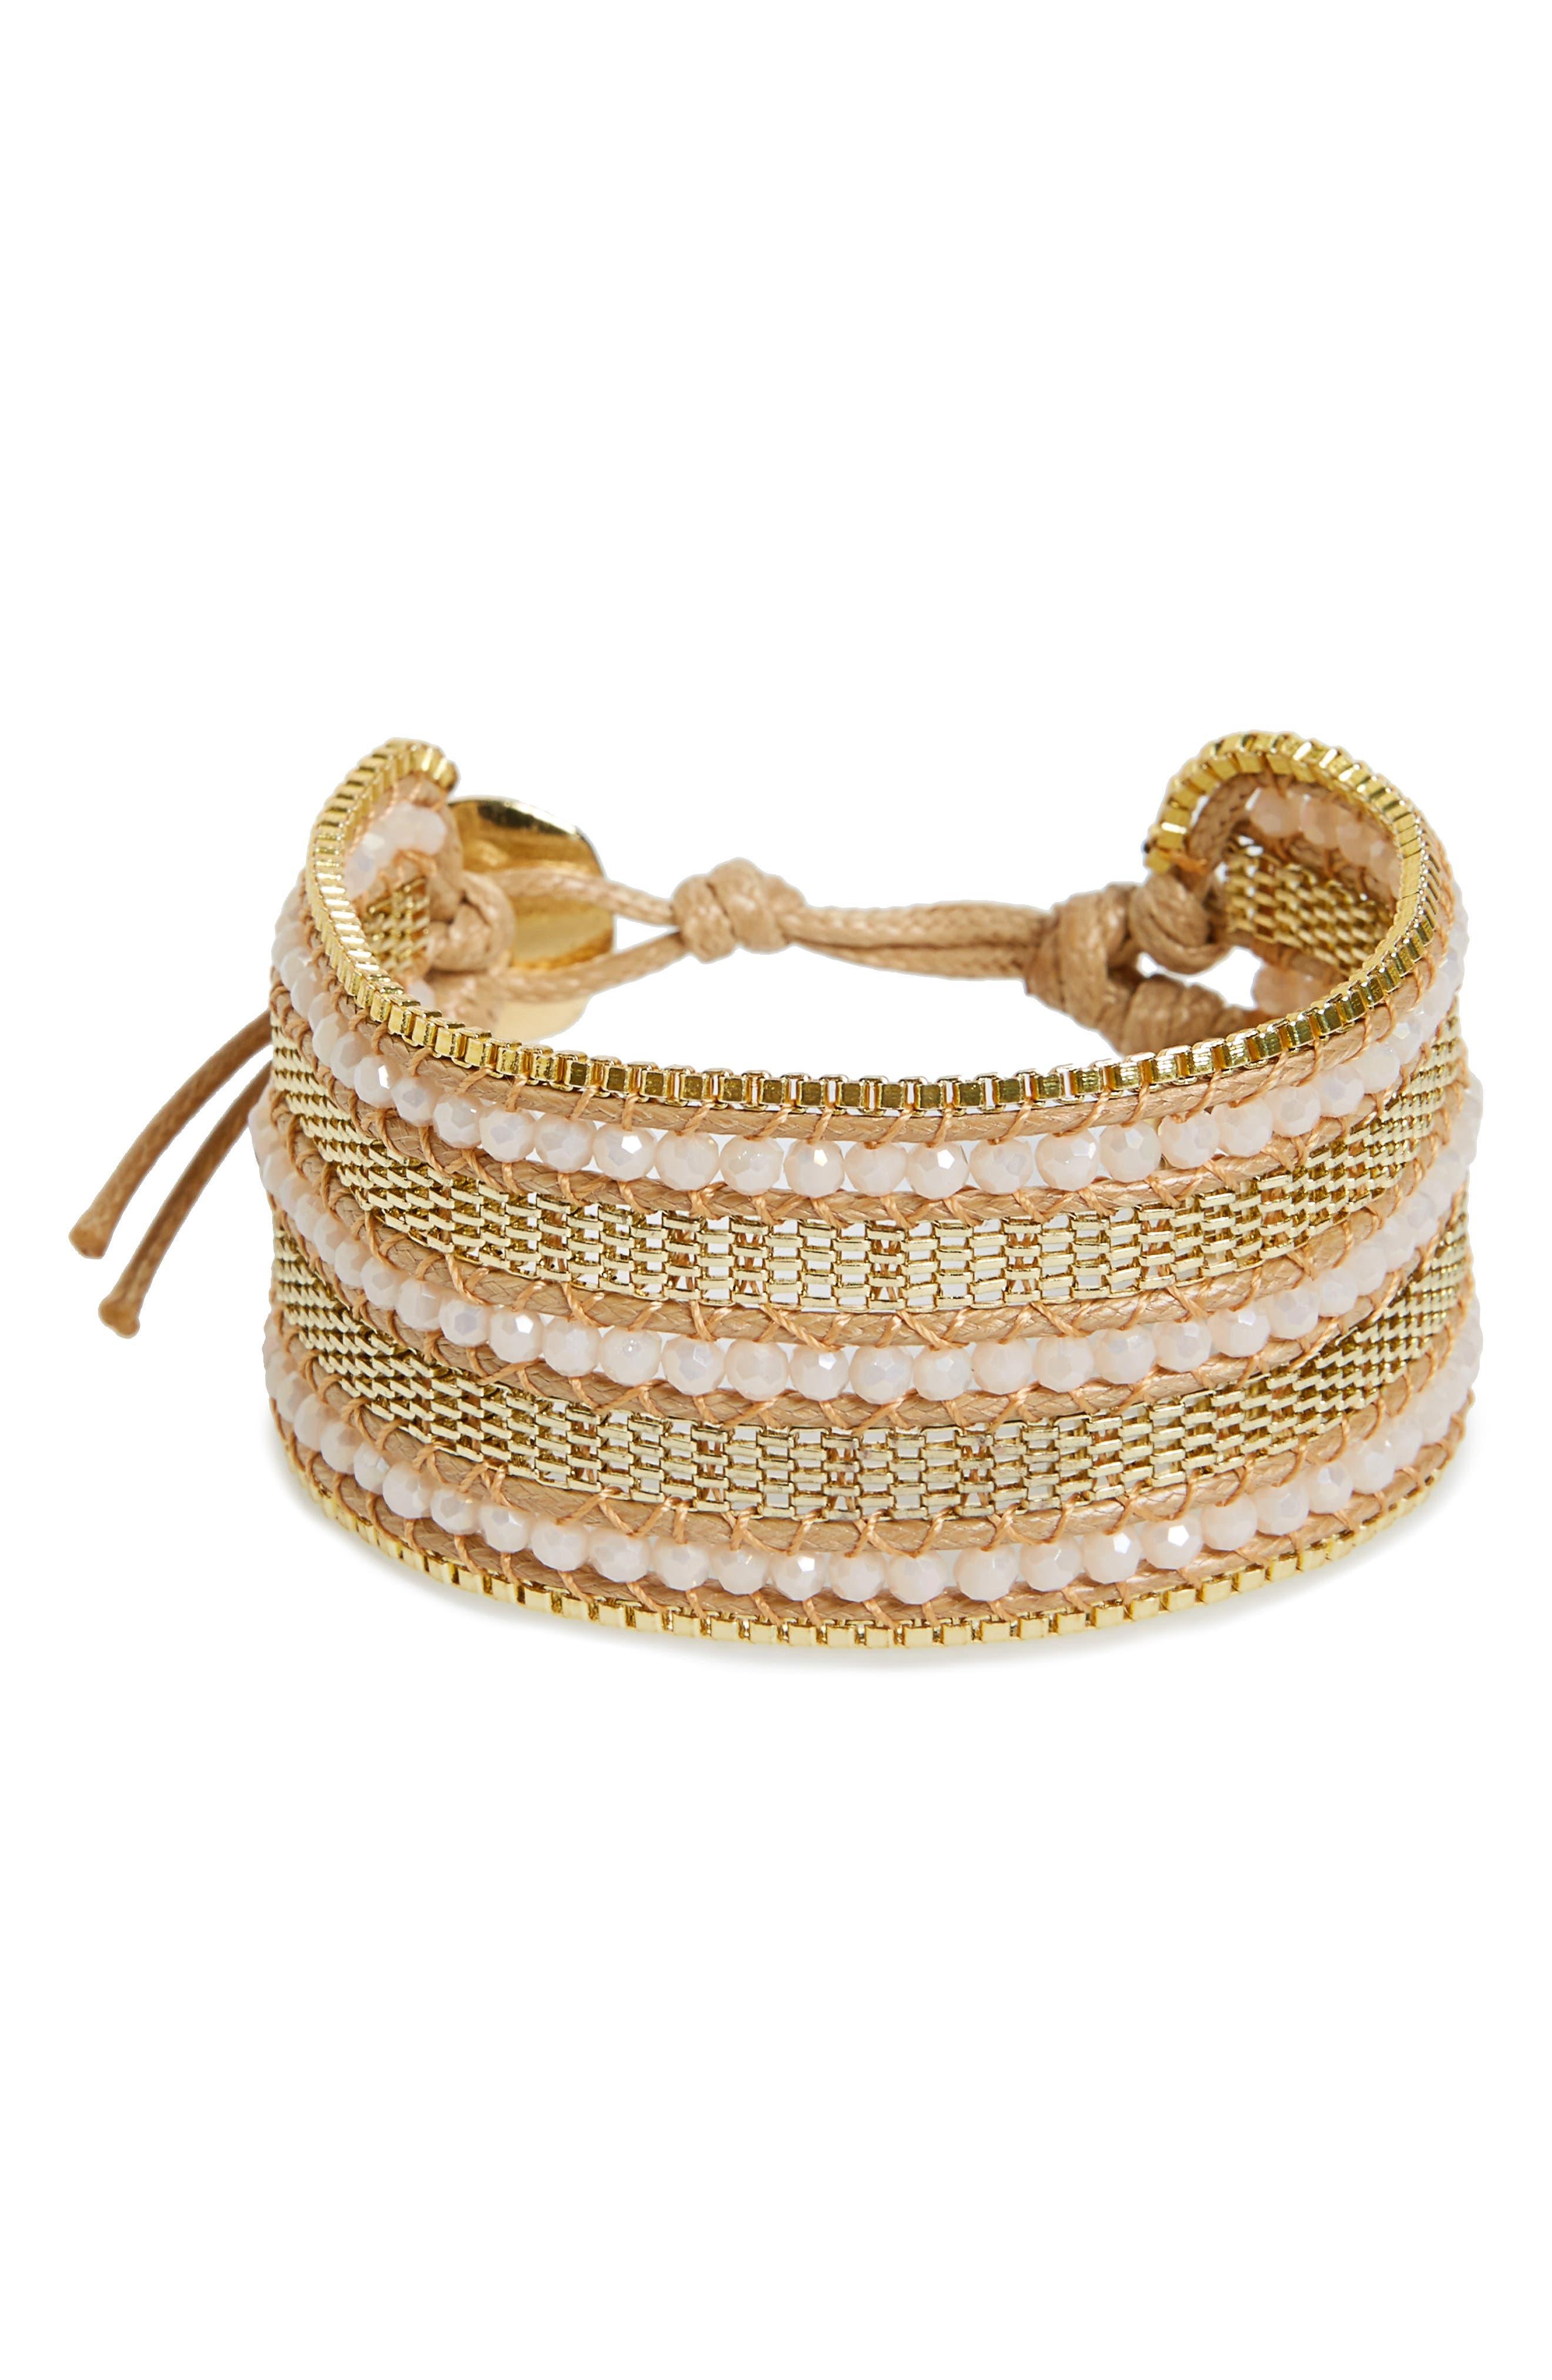 Panacea Crystal Chain Bracelet